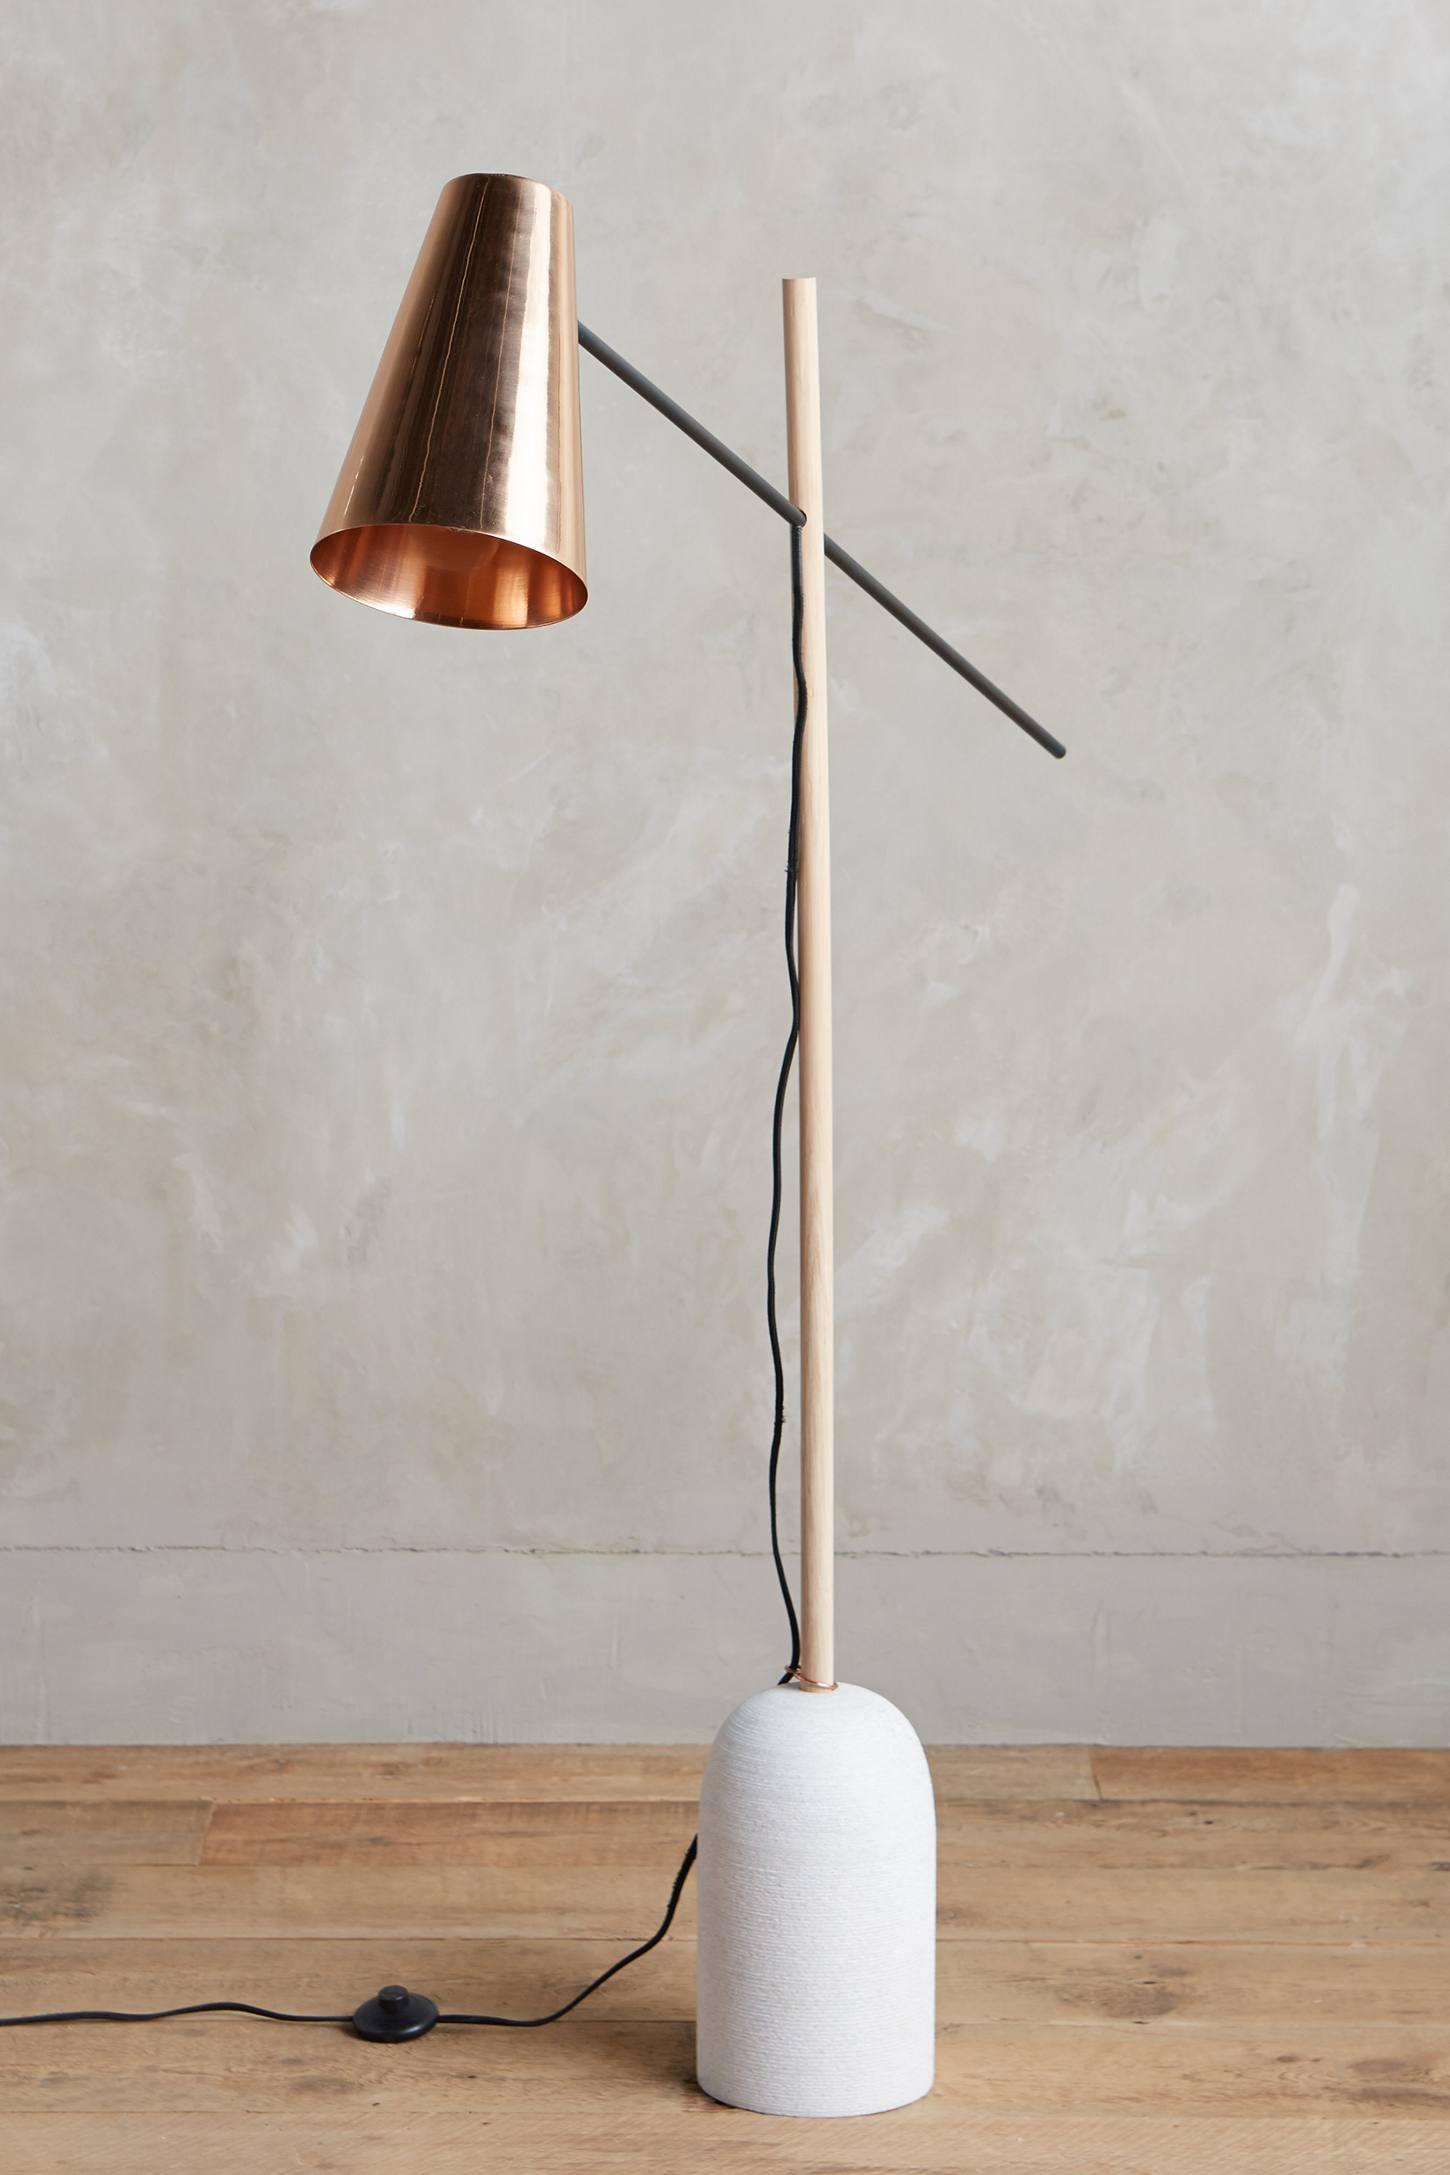 Copper floor lamp from Anthropologie